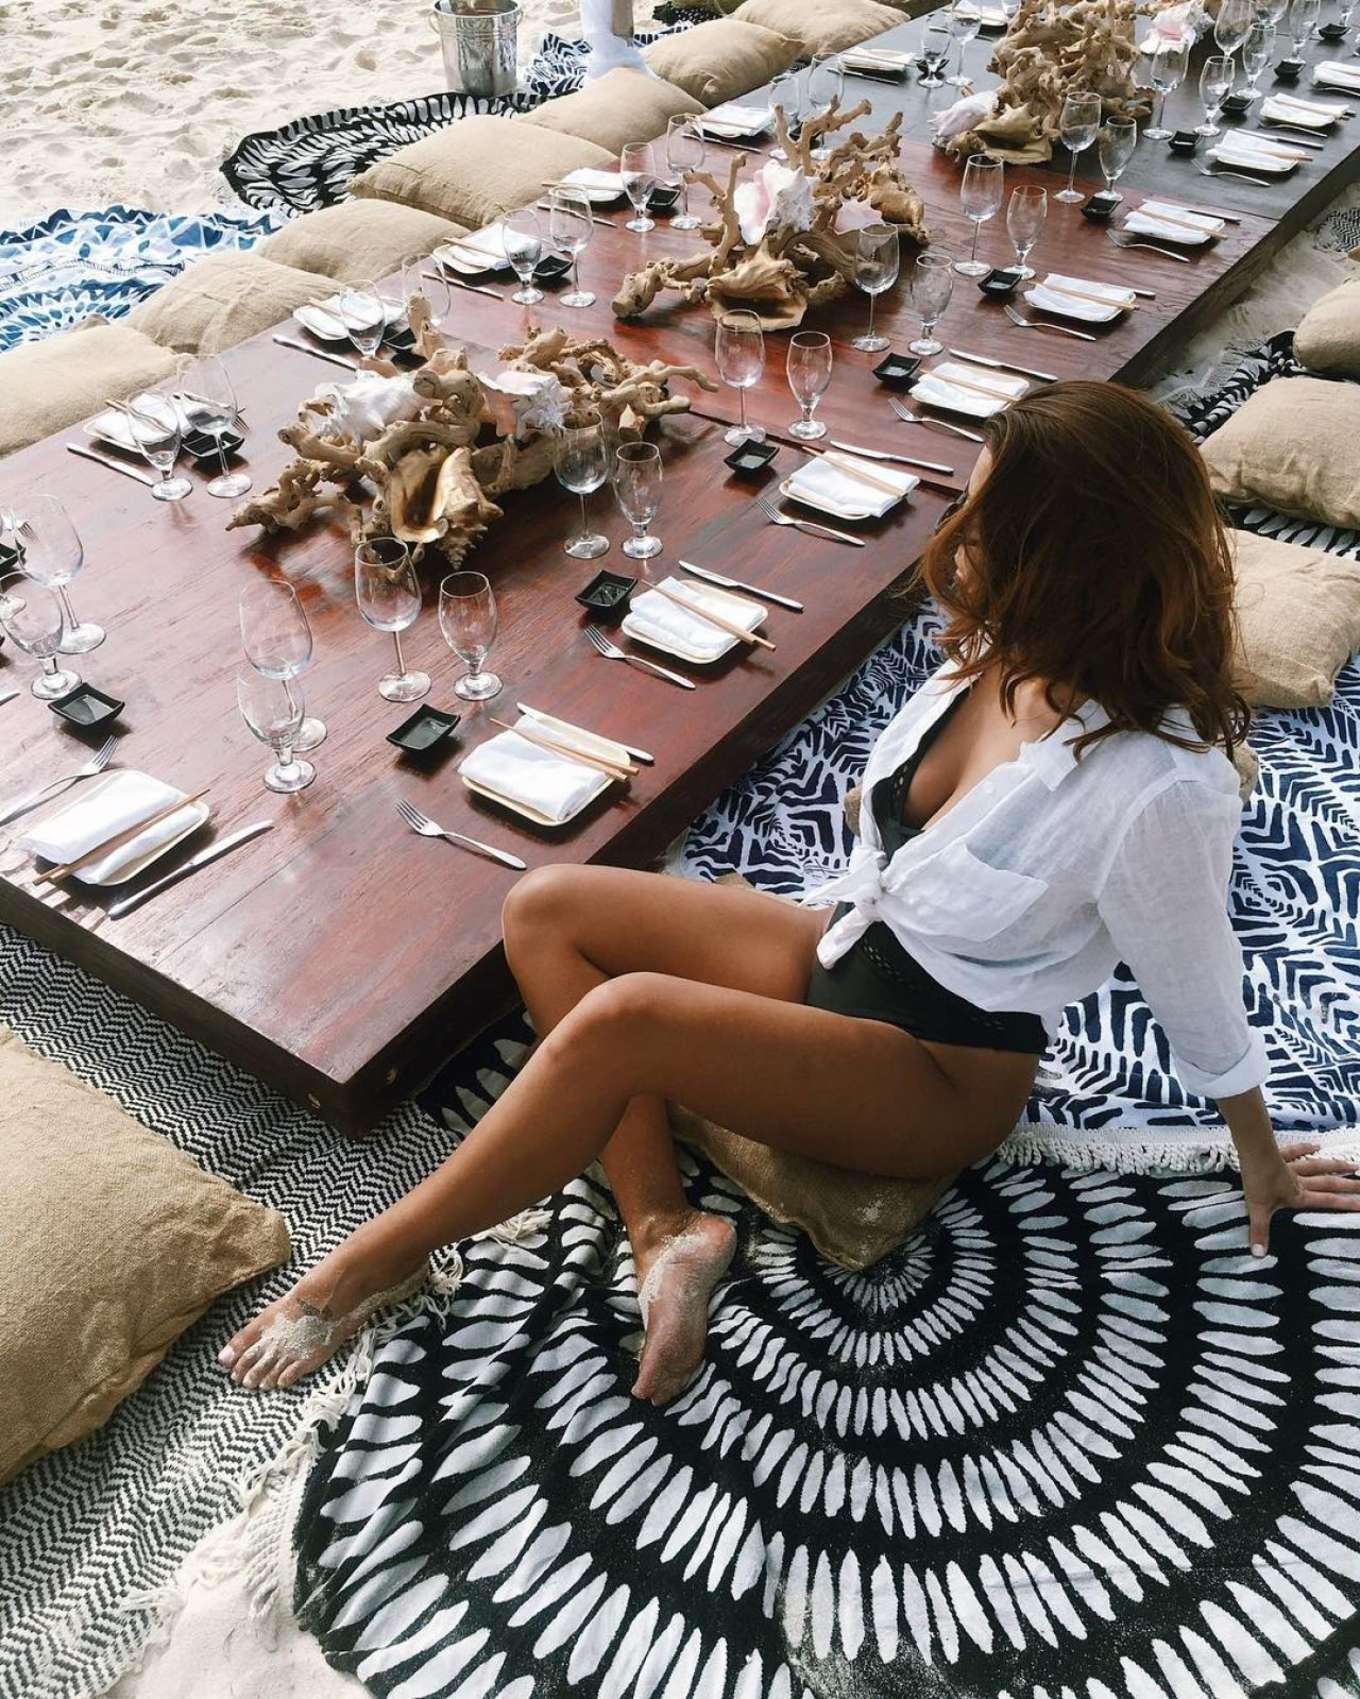 Candice Swanepoel Instagram Video images